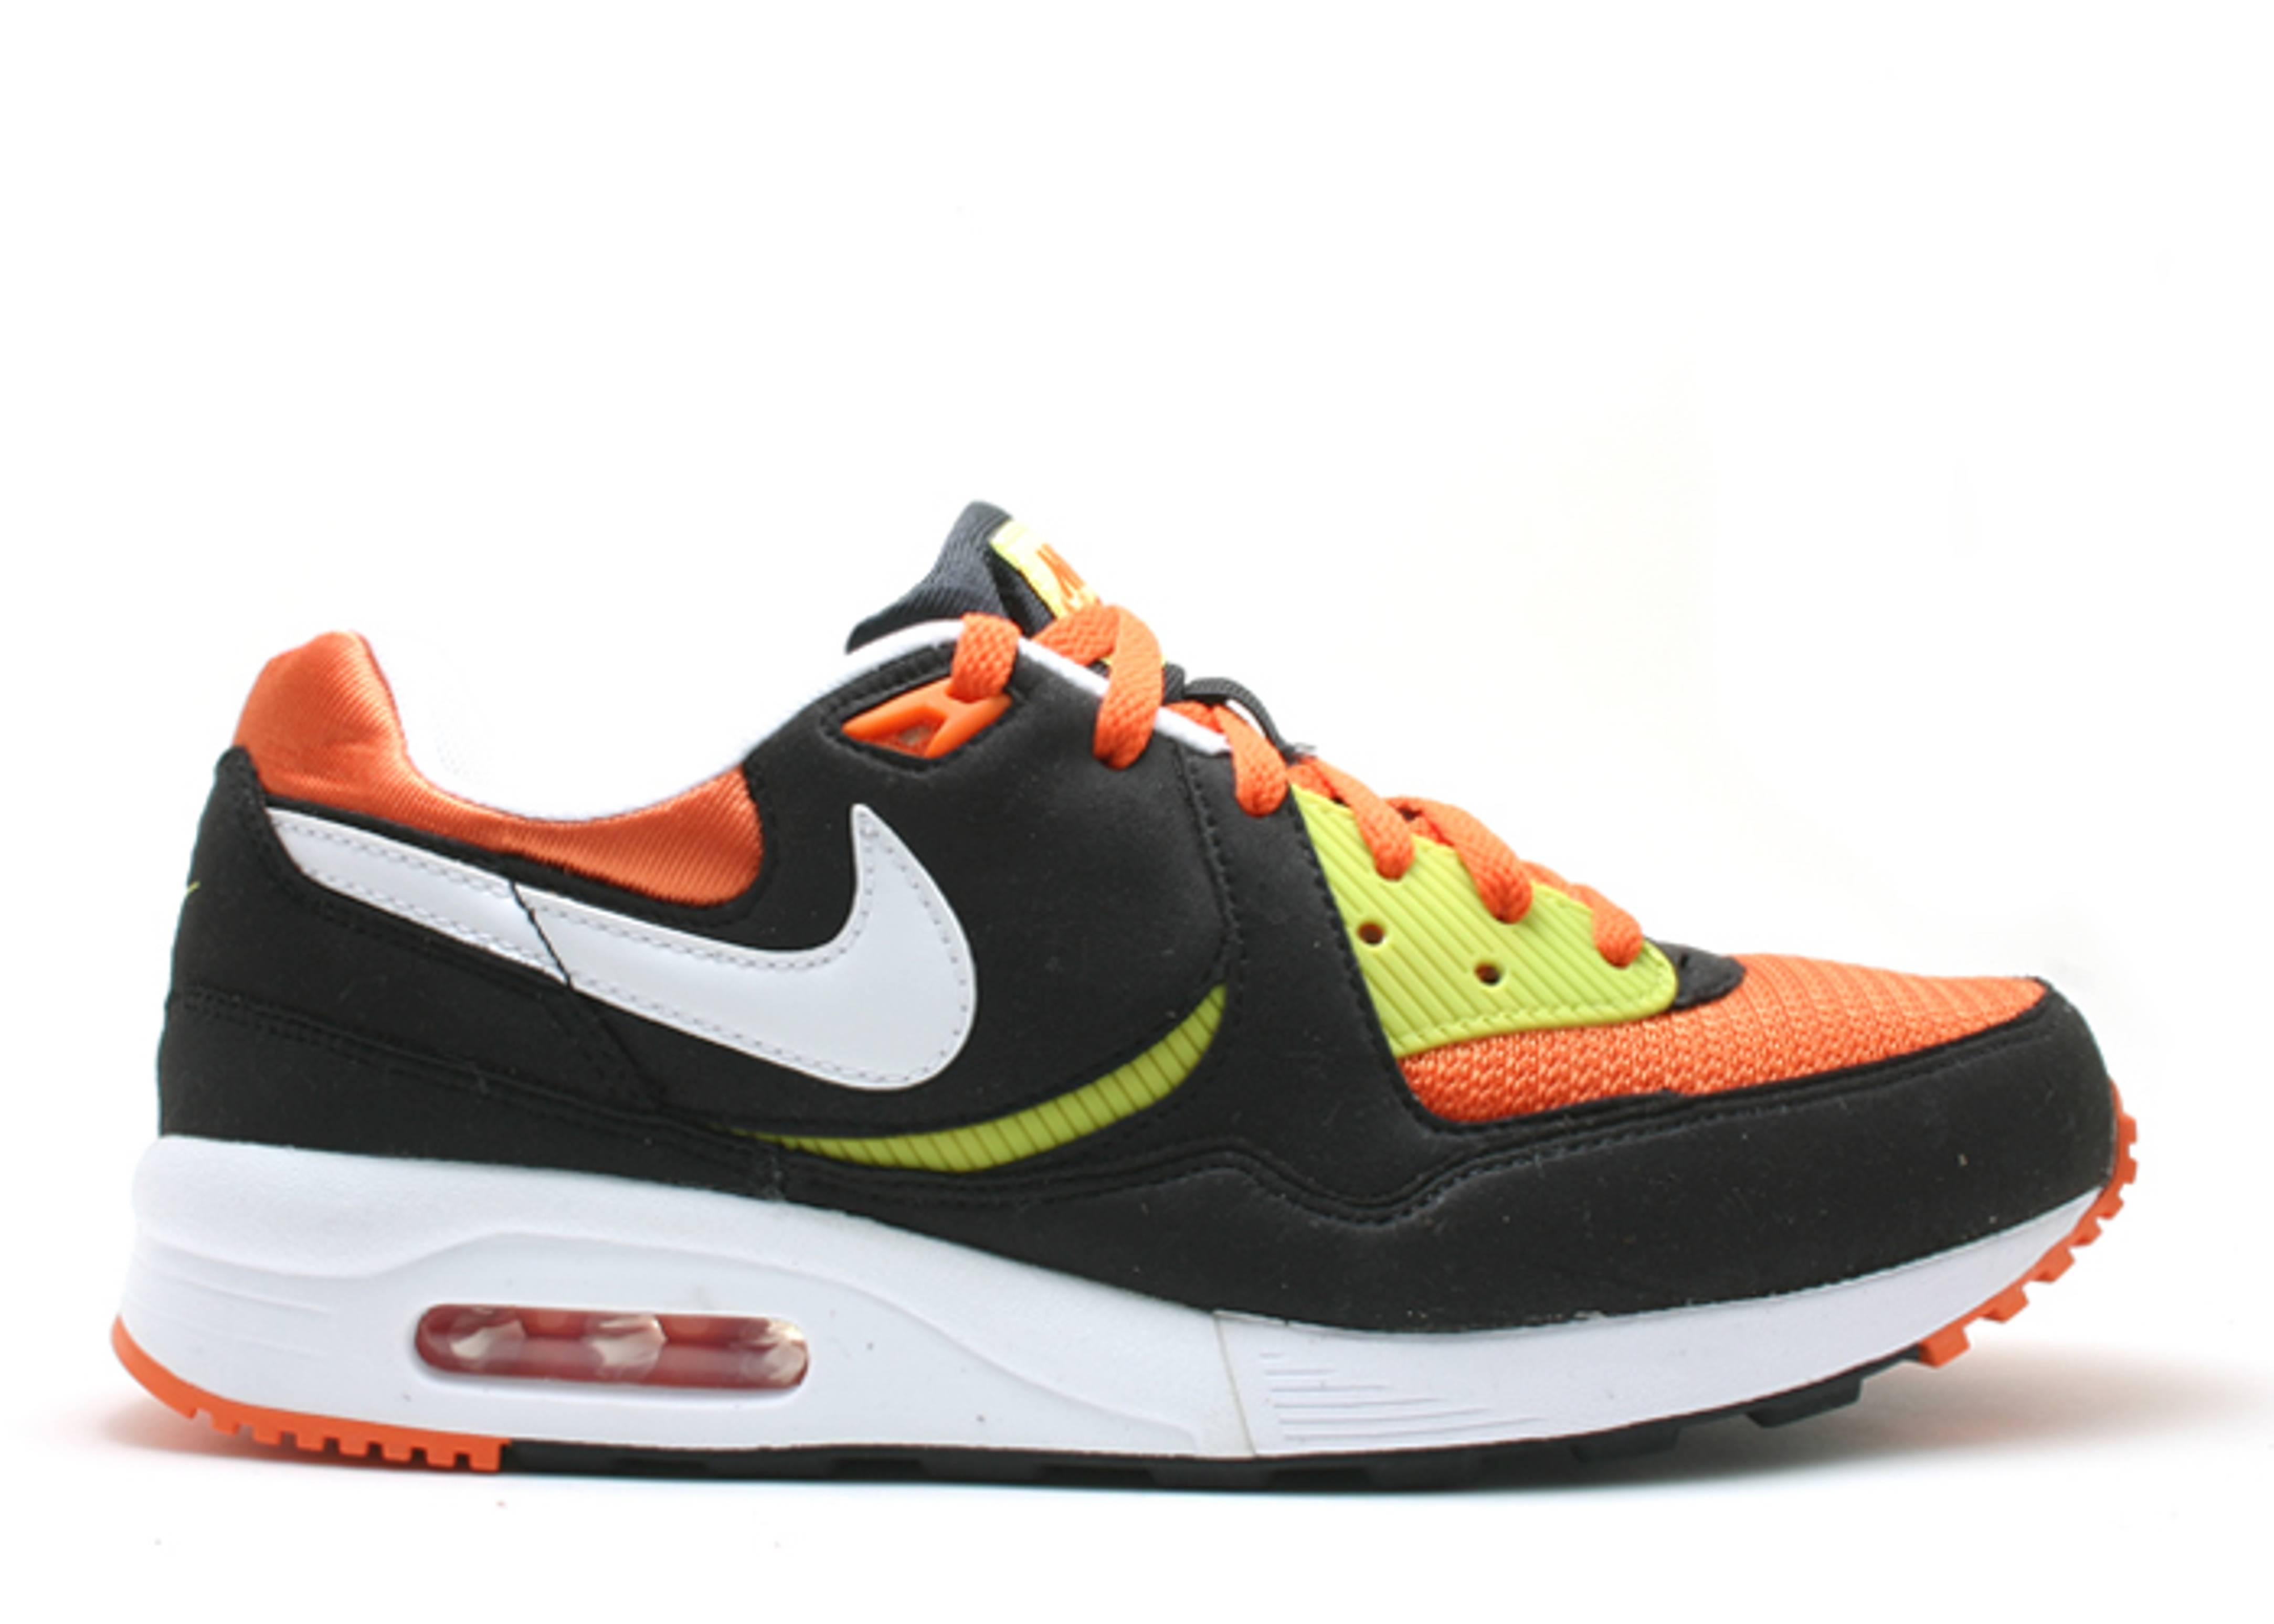 save off c9536 acee0 Air Max Light - Nike - 315827 014 - blackwhite-bright cactus-orange blaze   Flight Club